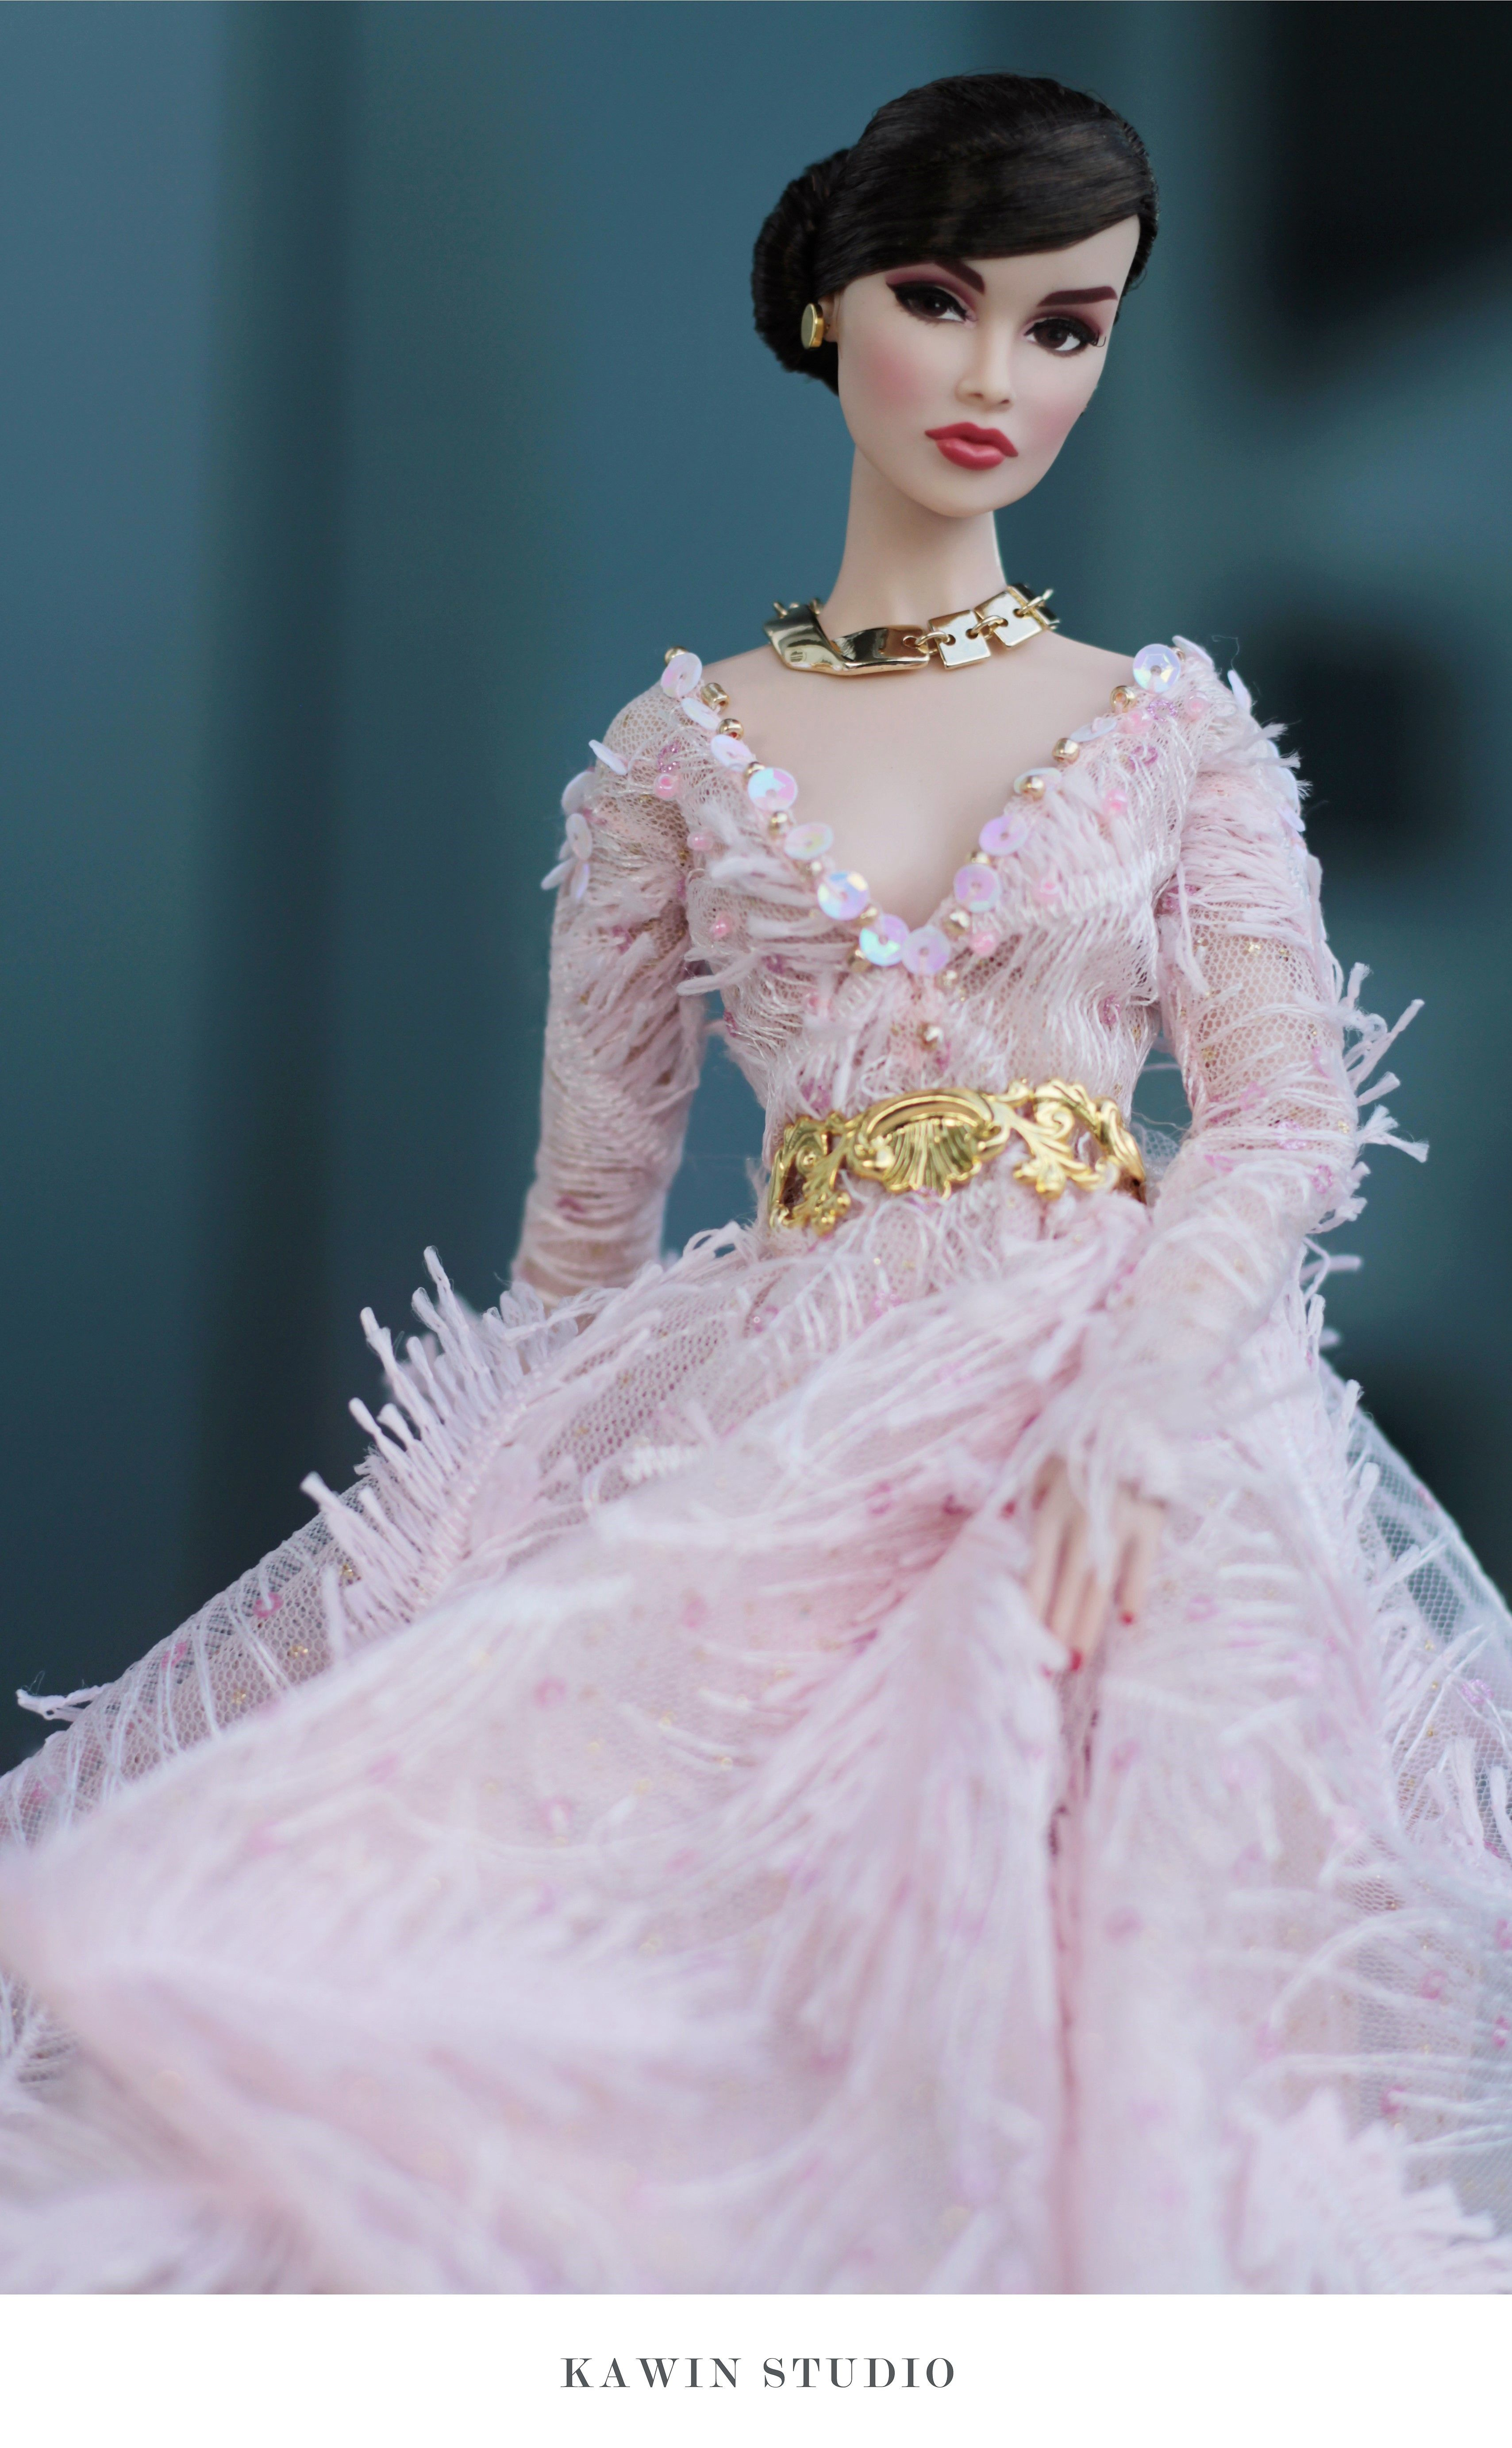 12.28.4 Kawin Tan | G.Hilarion | Pinterest | Fashion royalty dolls ...